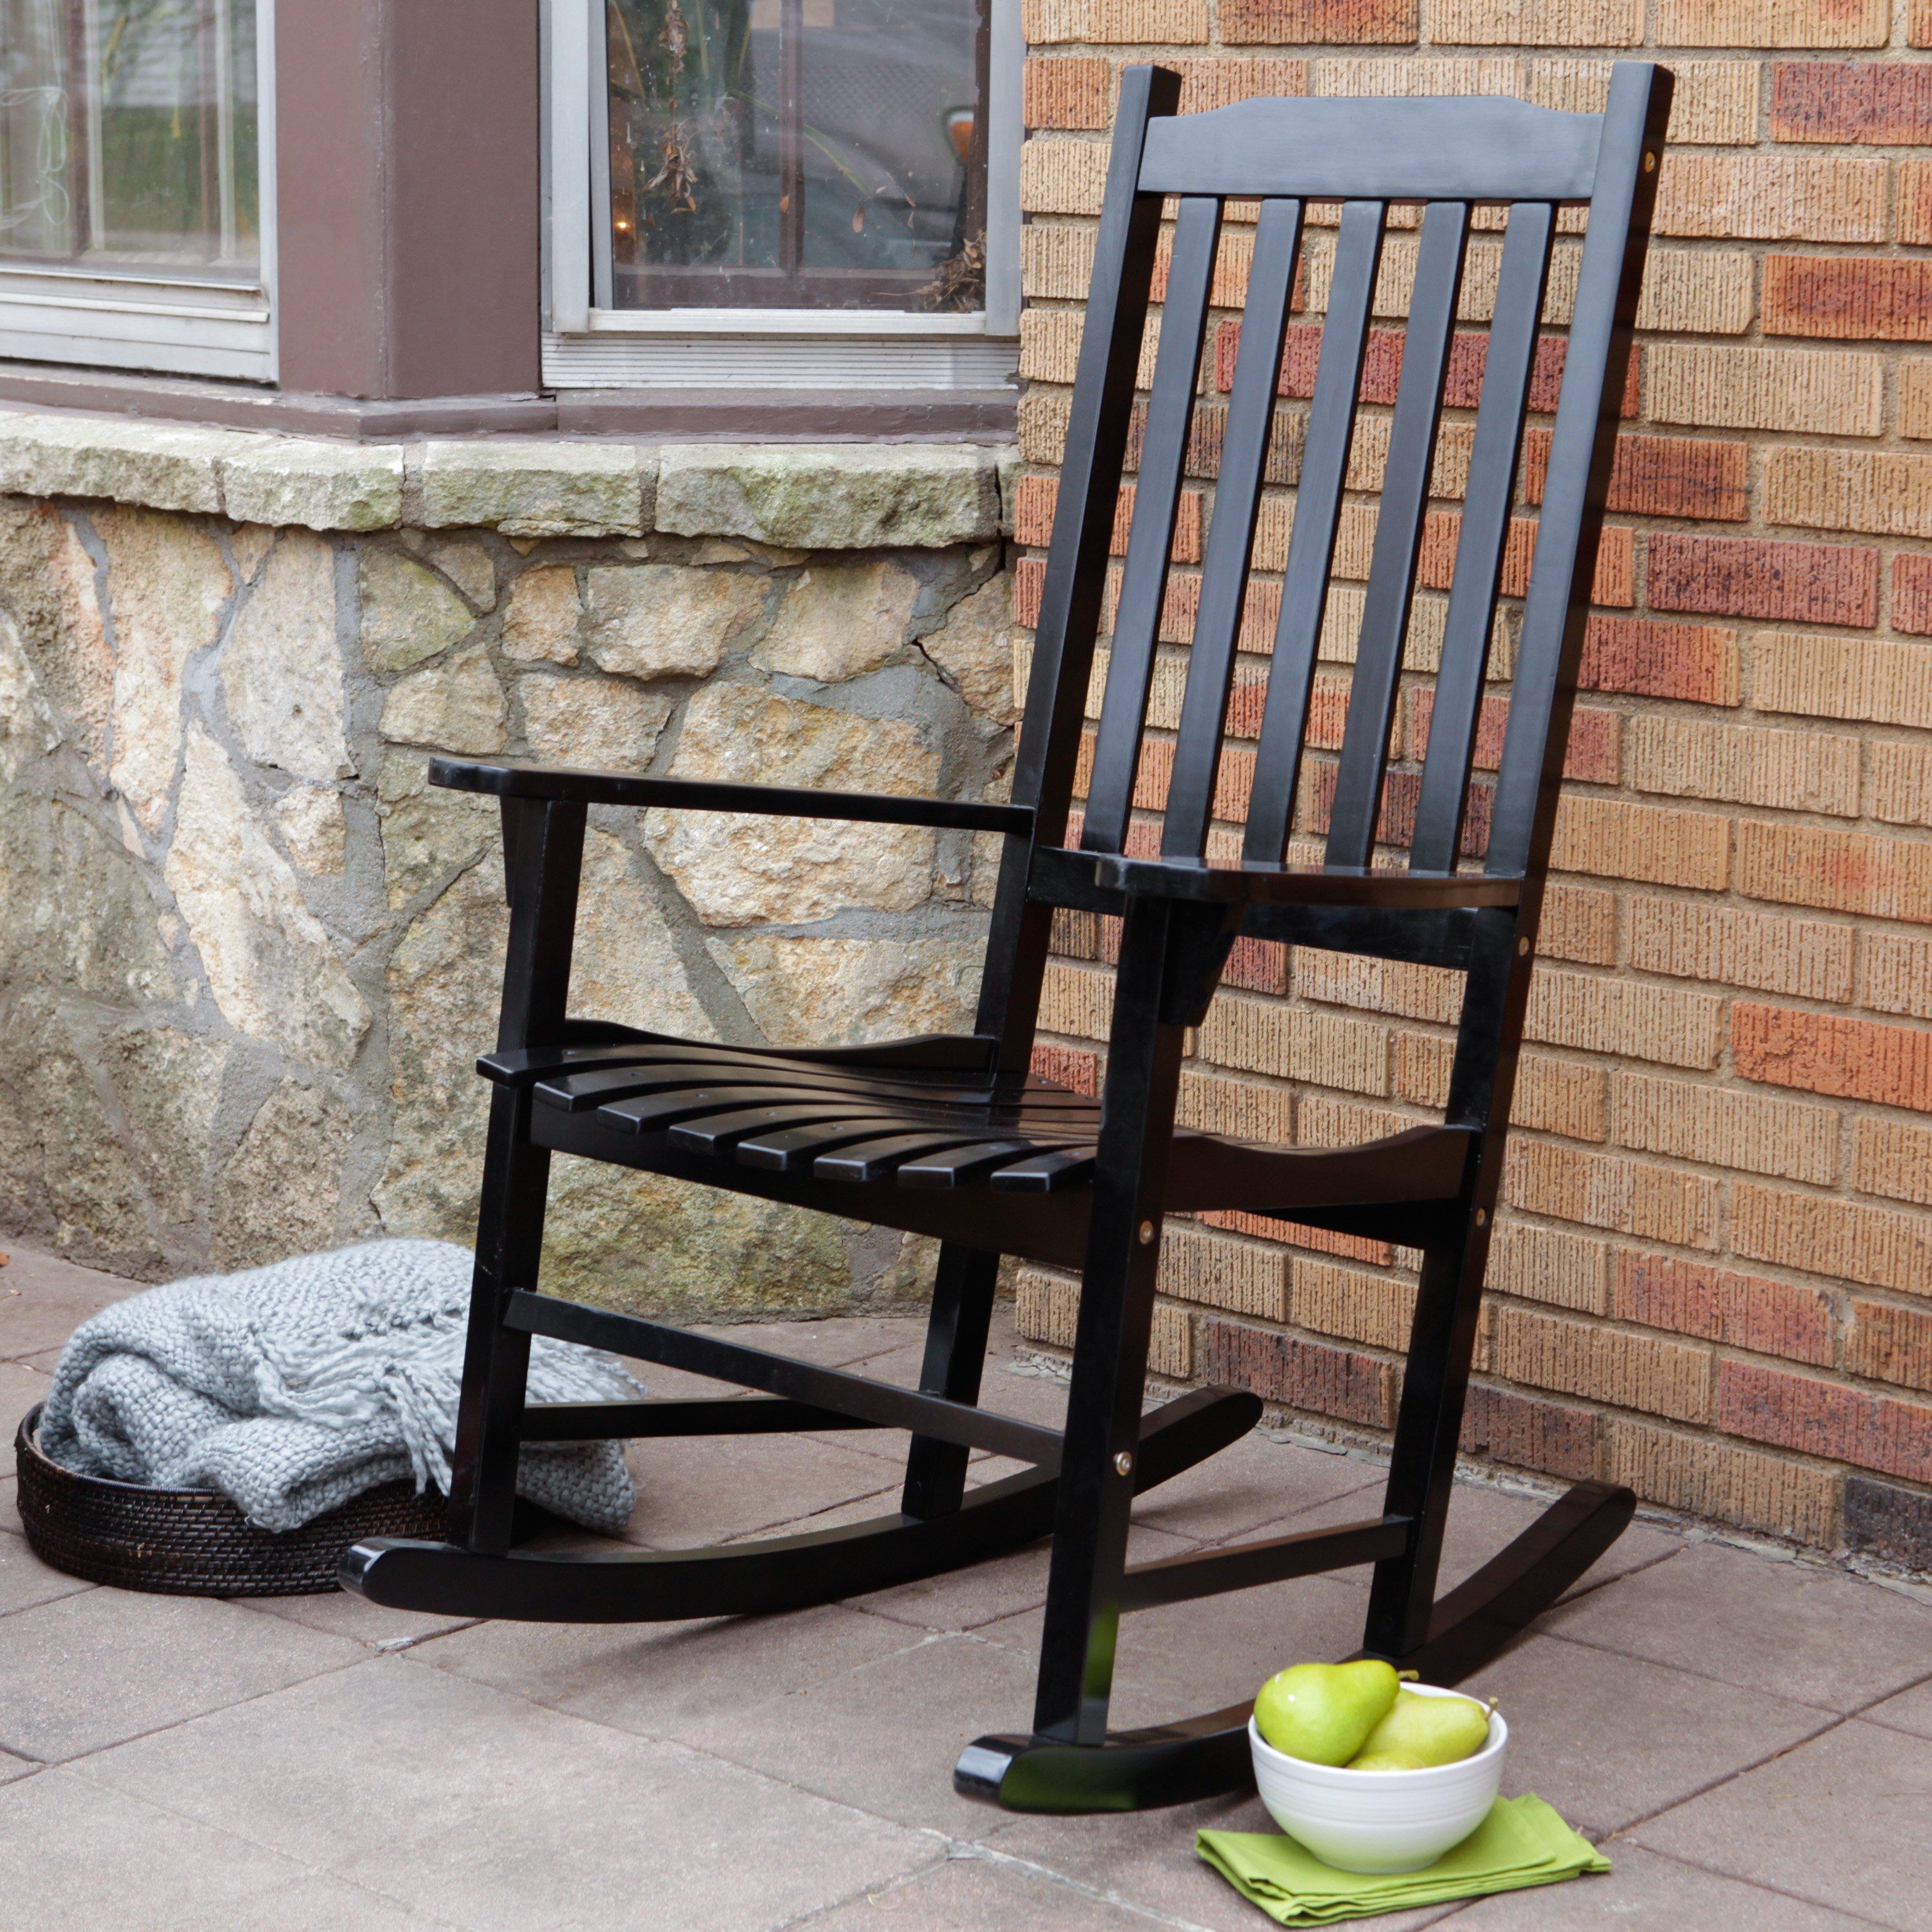 outdoor rocking chair belham living cottonwood indoor/outdoor wood rocking chair - gray |  hayneedle NPBPYUU